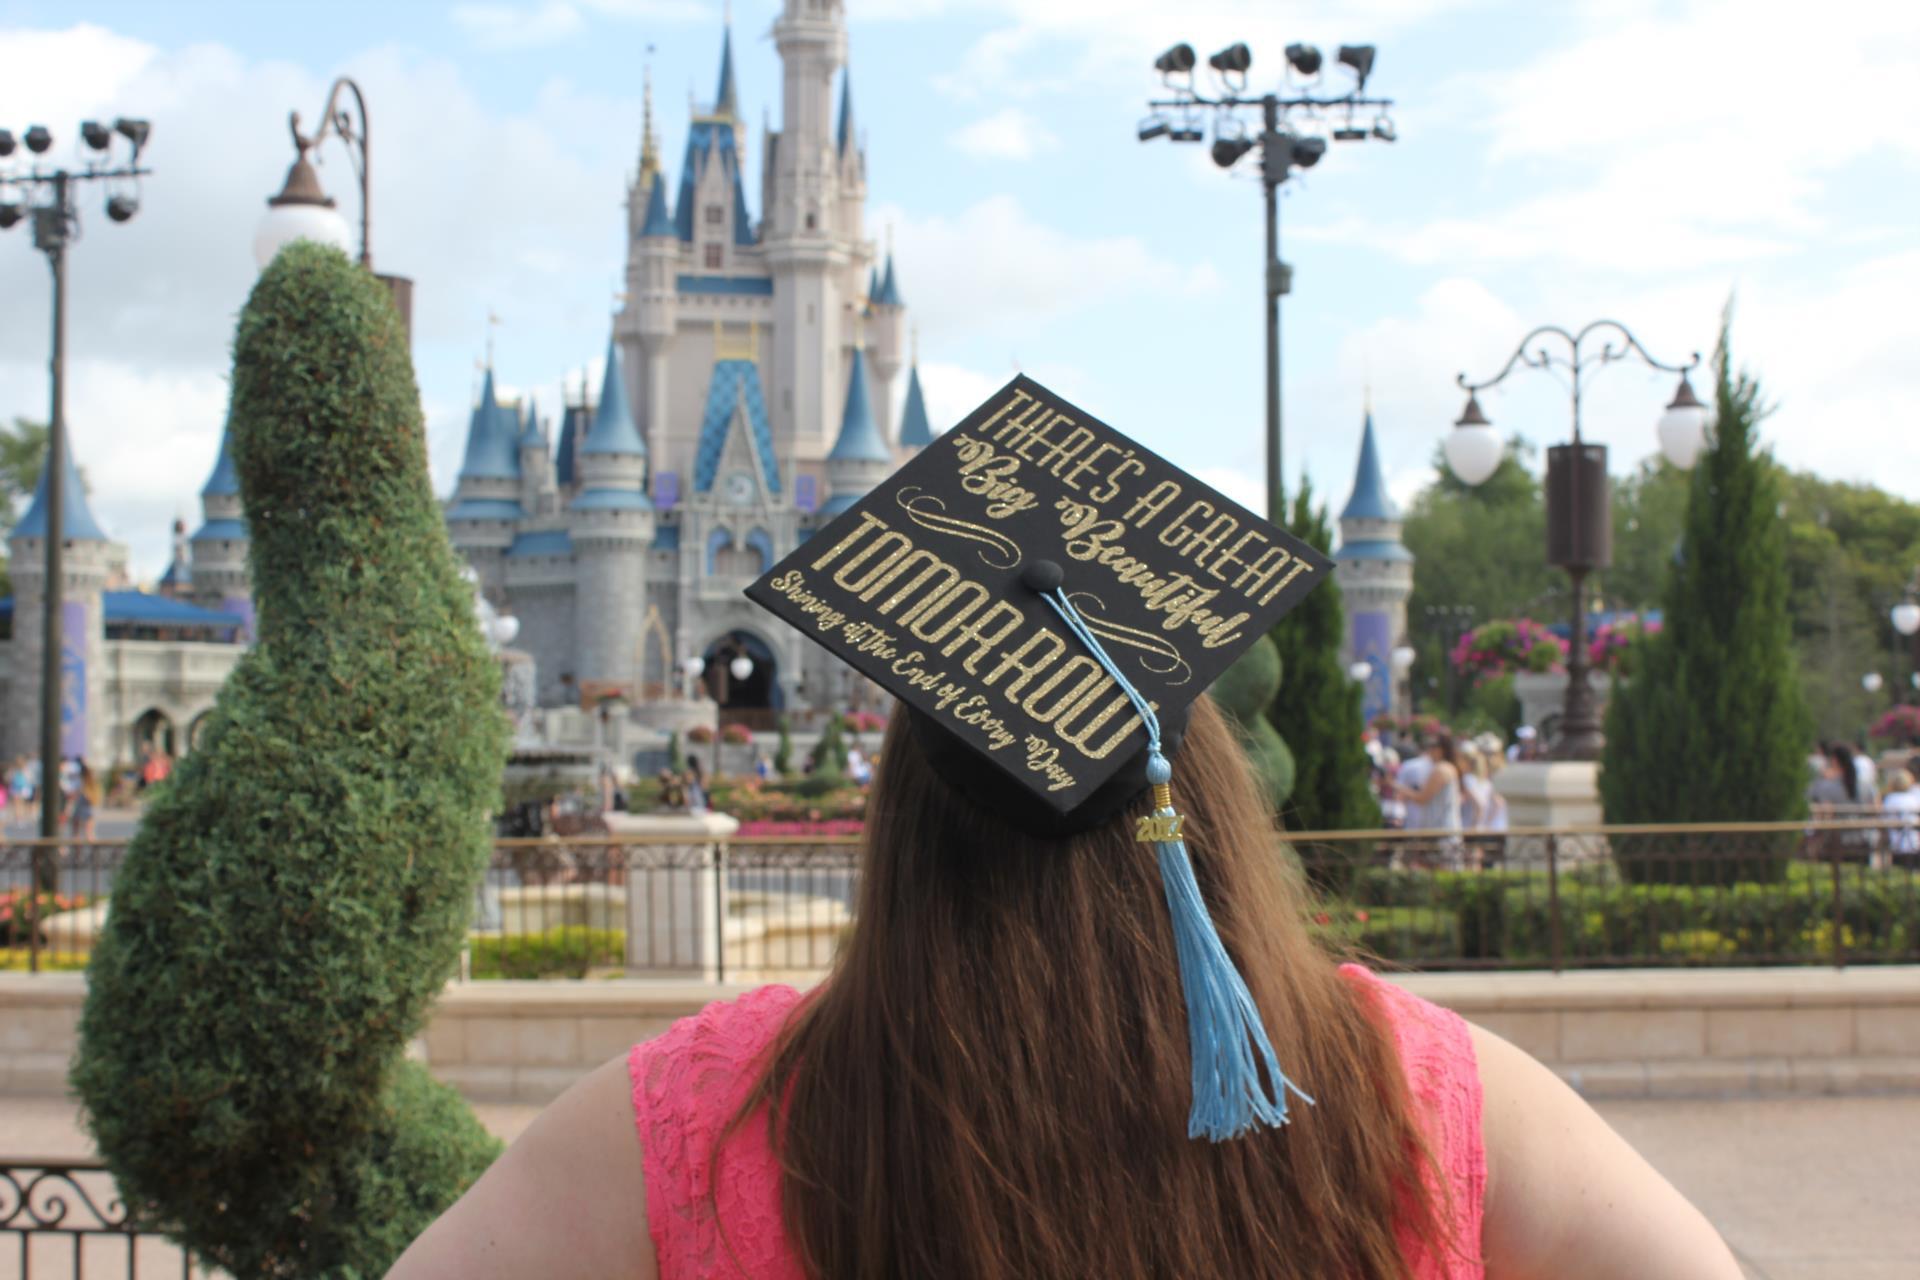 Mrs. Bilsky in Graduation Cap Looking at Disney World Castle